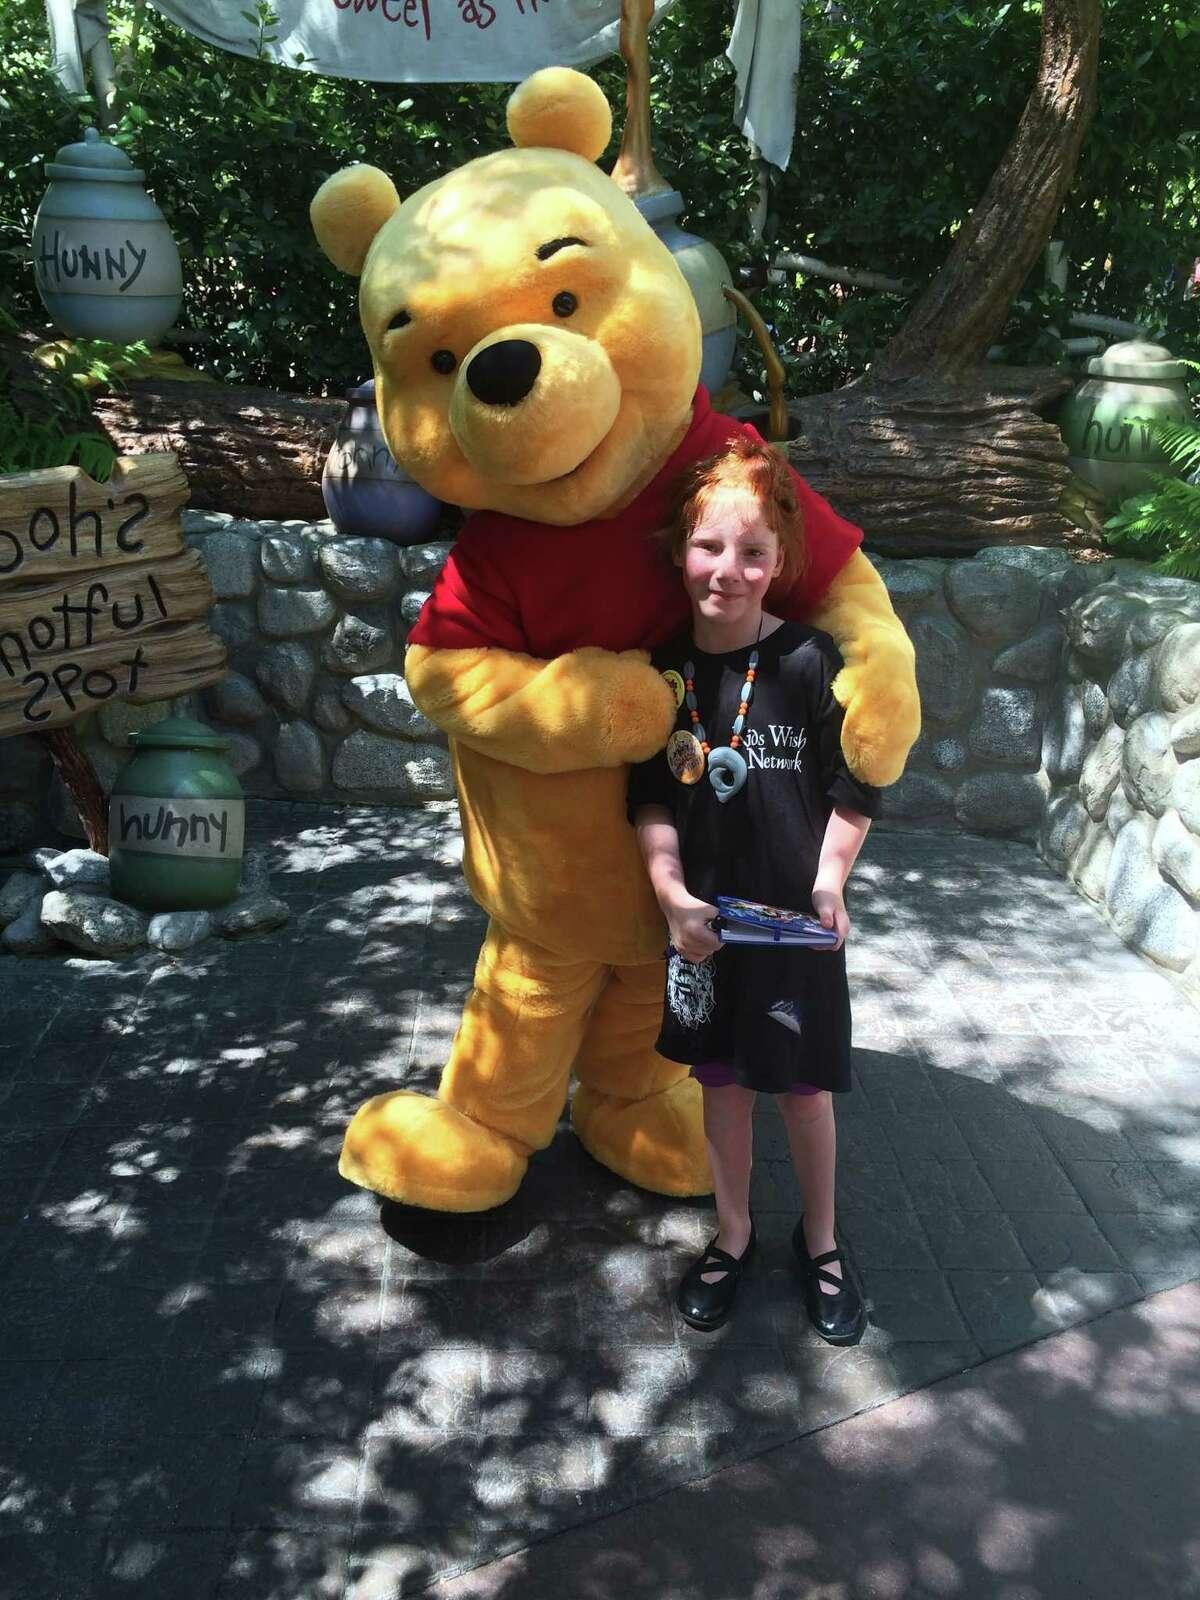 Waco Winnie the Pooh